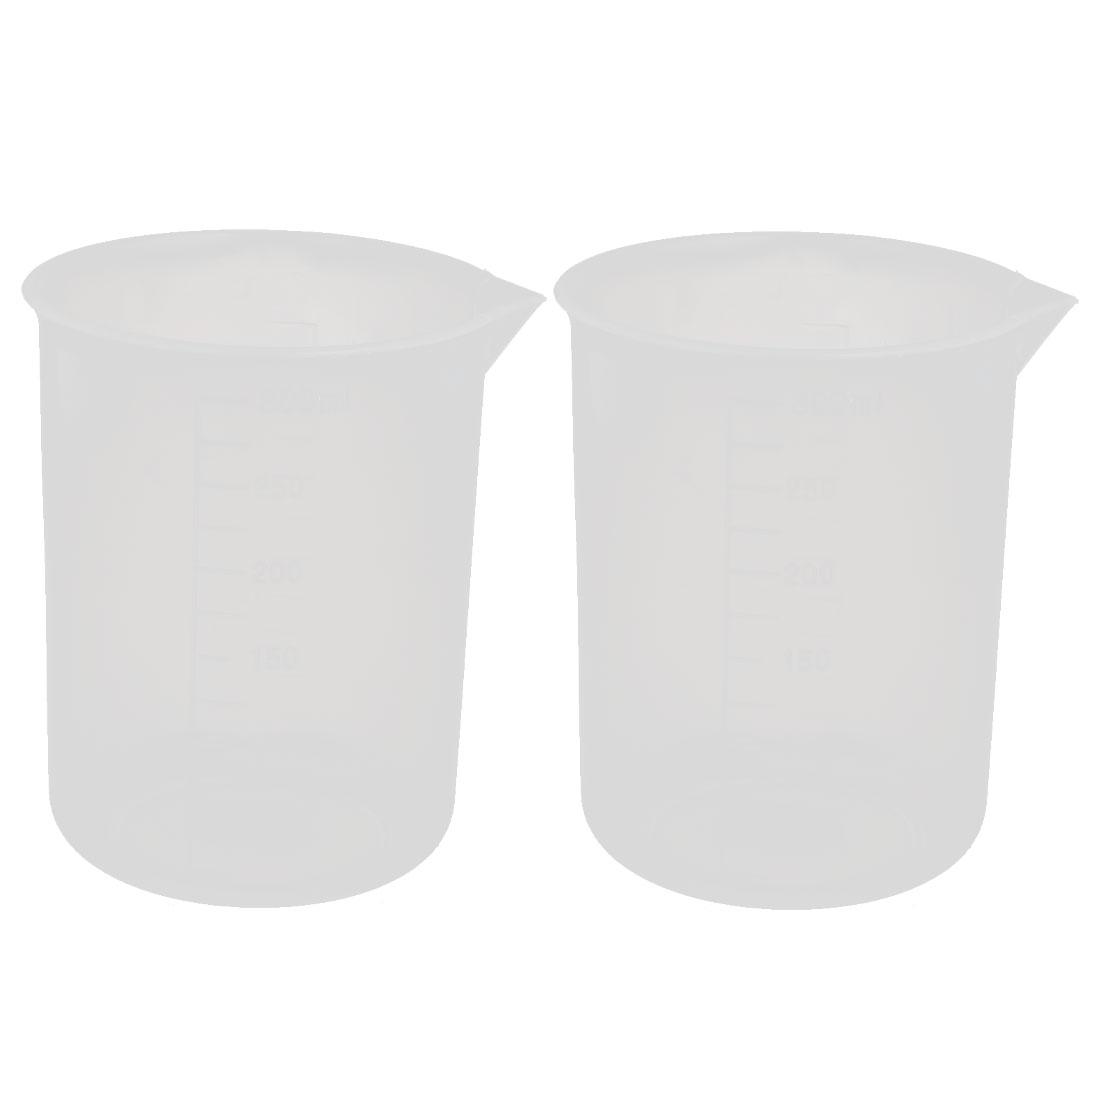 2pcs 250mL Laboratory Plastic Liquid Container Measuring Cup Beaker Clear